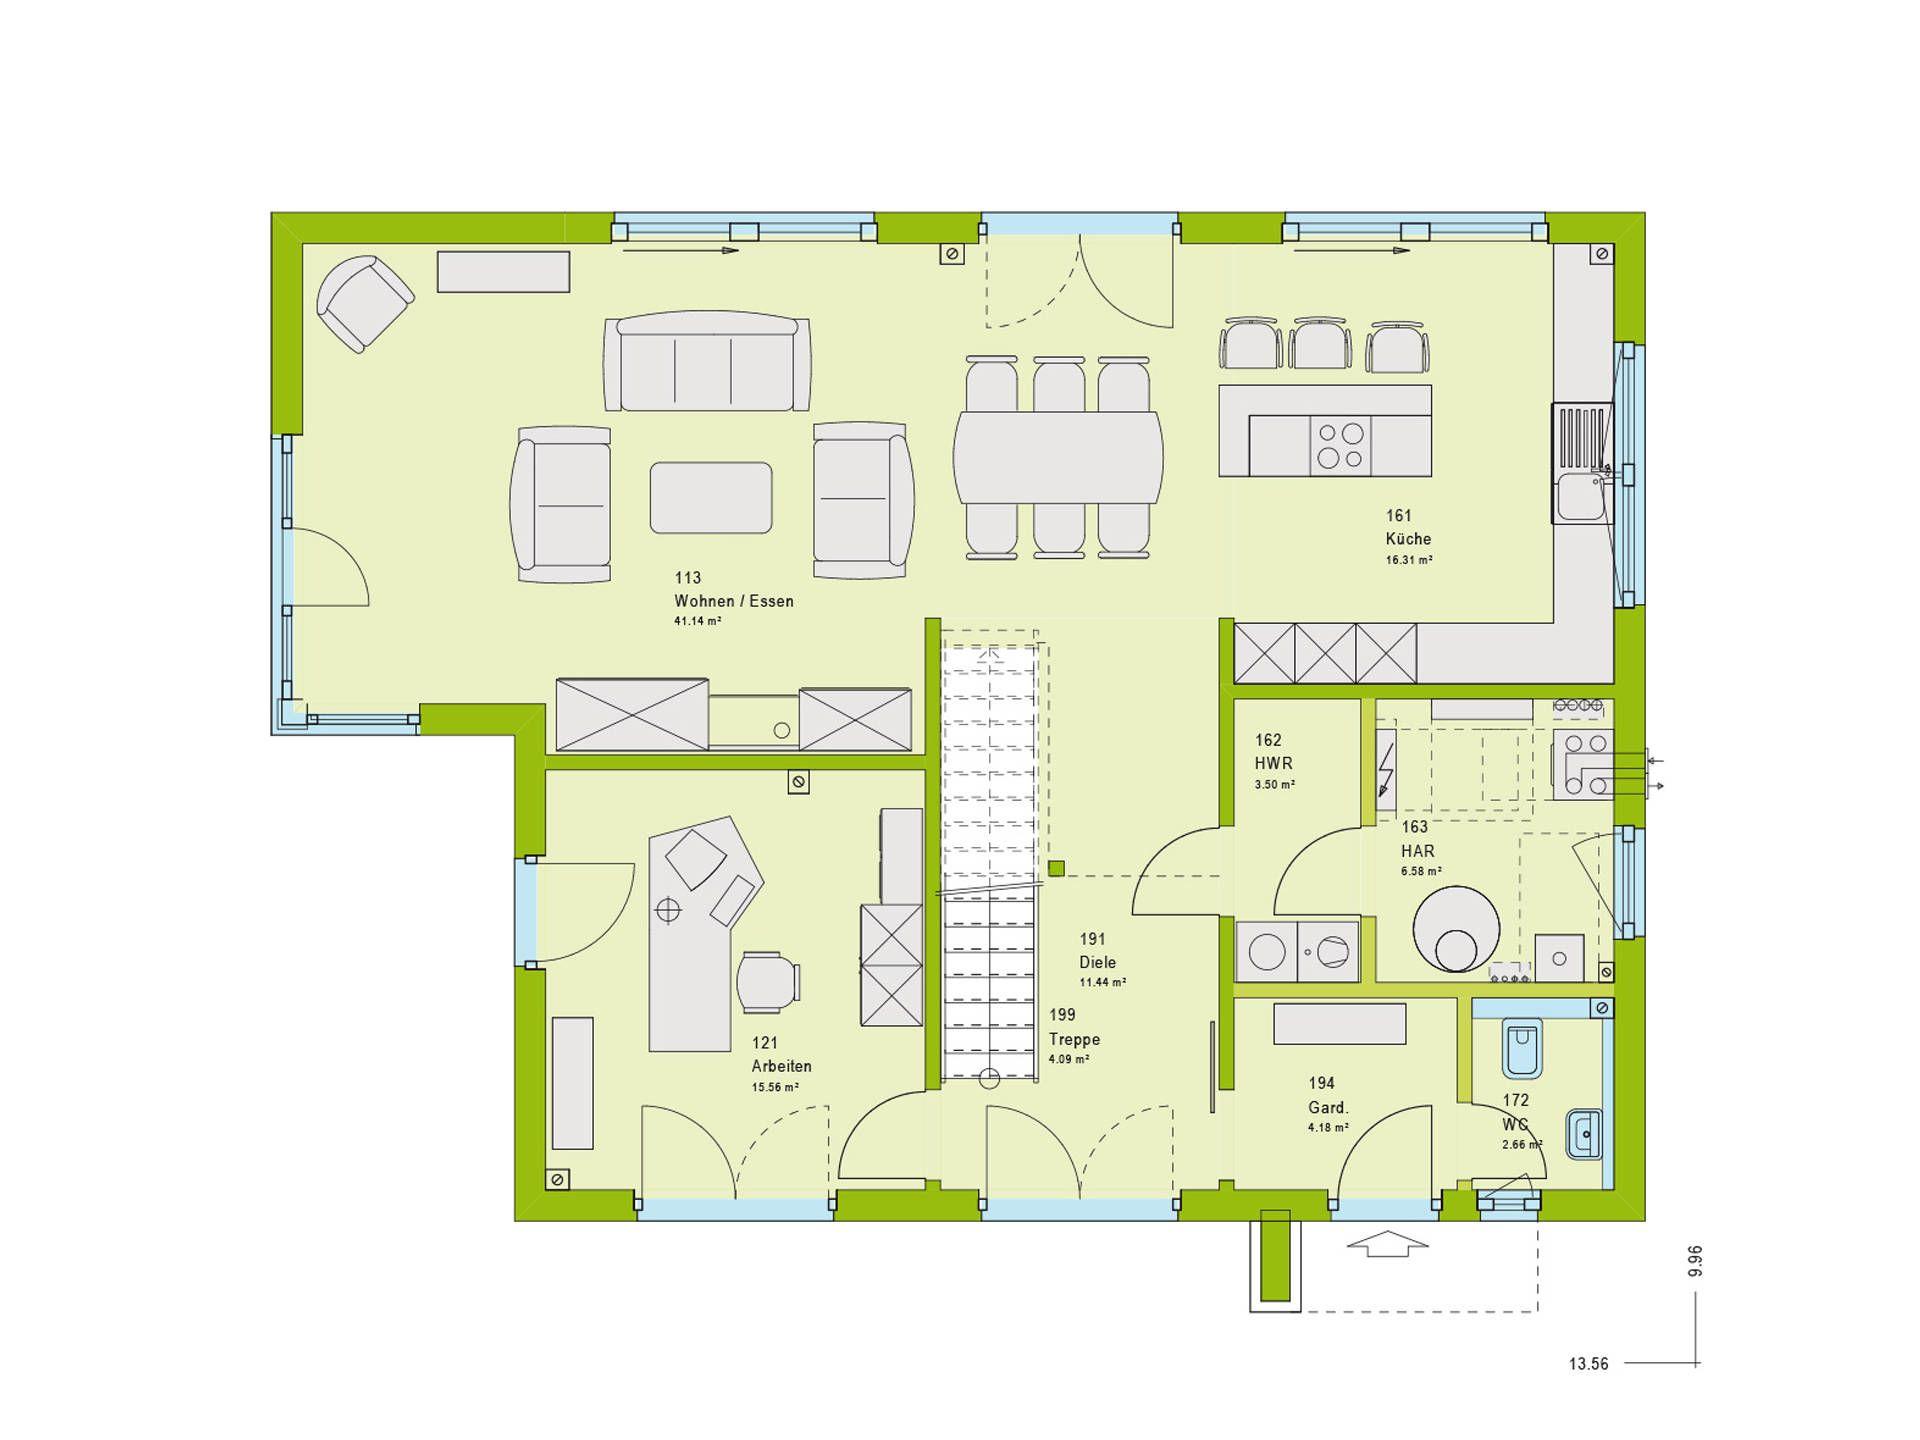 grundriss eg grundriss eg als pdf with grundriss eg reuterweg grundriss eg with grundriss eg. Black Bedroom Furniture Sets. Home Design Ideas